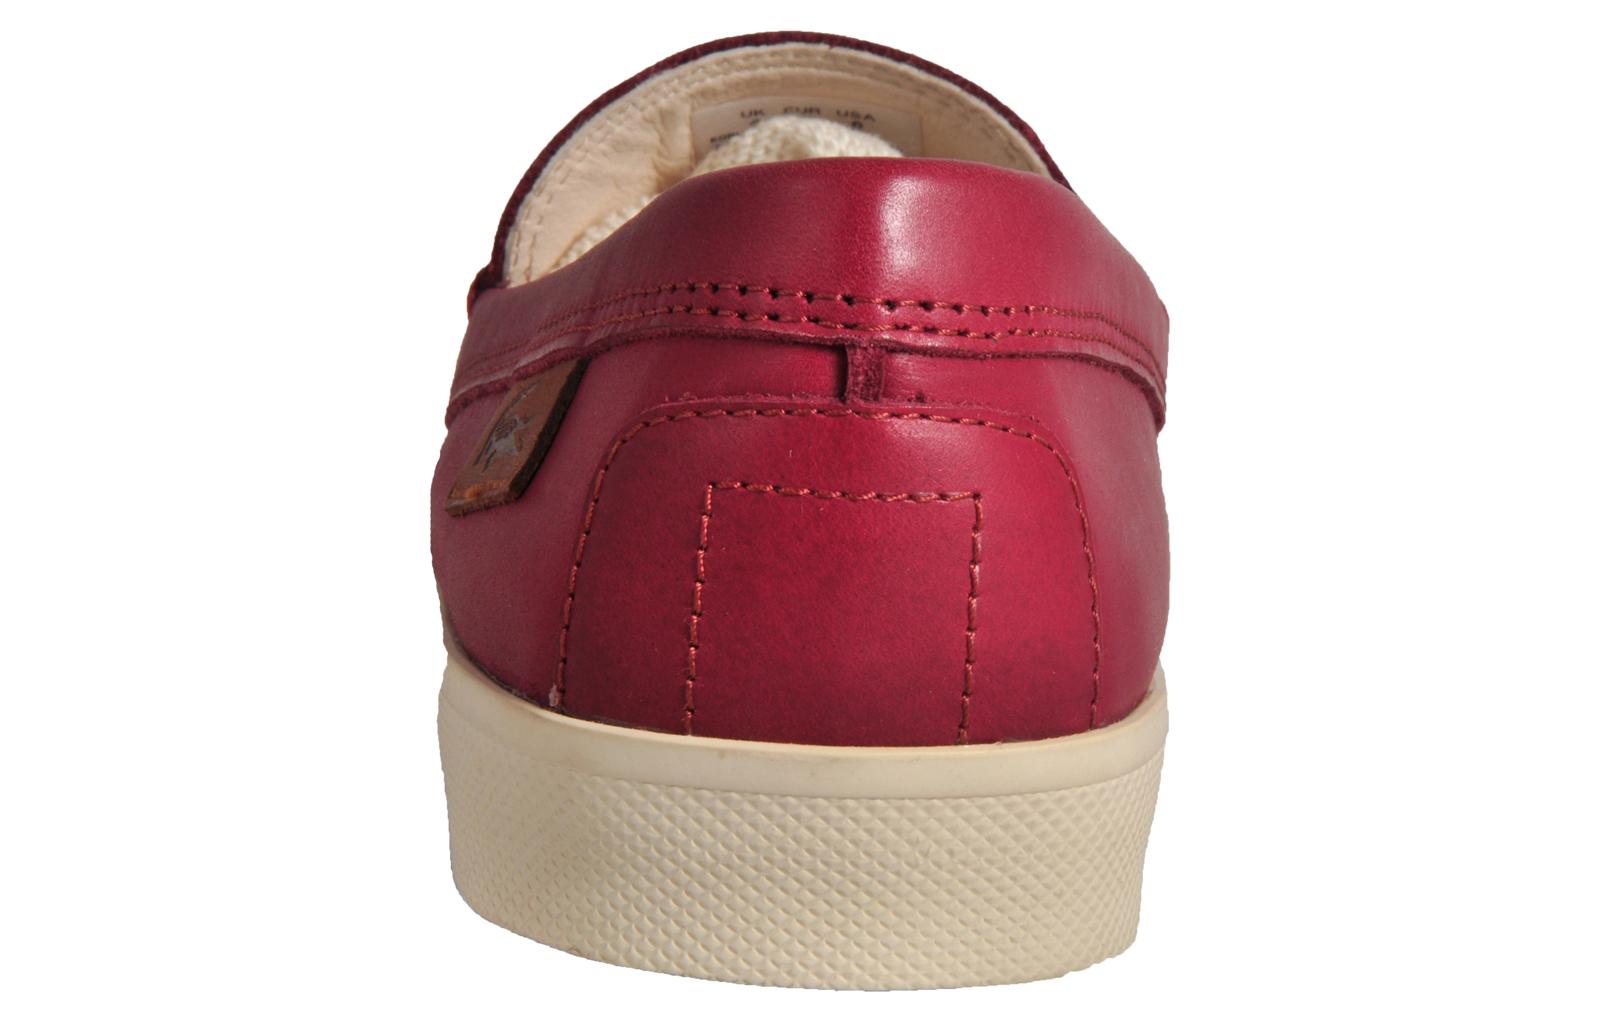 51e7d5d7f614 Lacoste Korlas 3 Women s Premium Leather Moccasin Loafer Burgundy